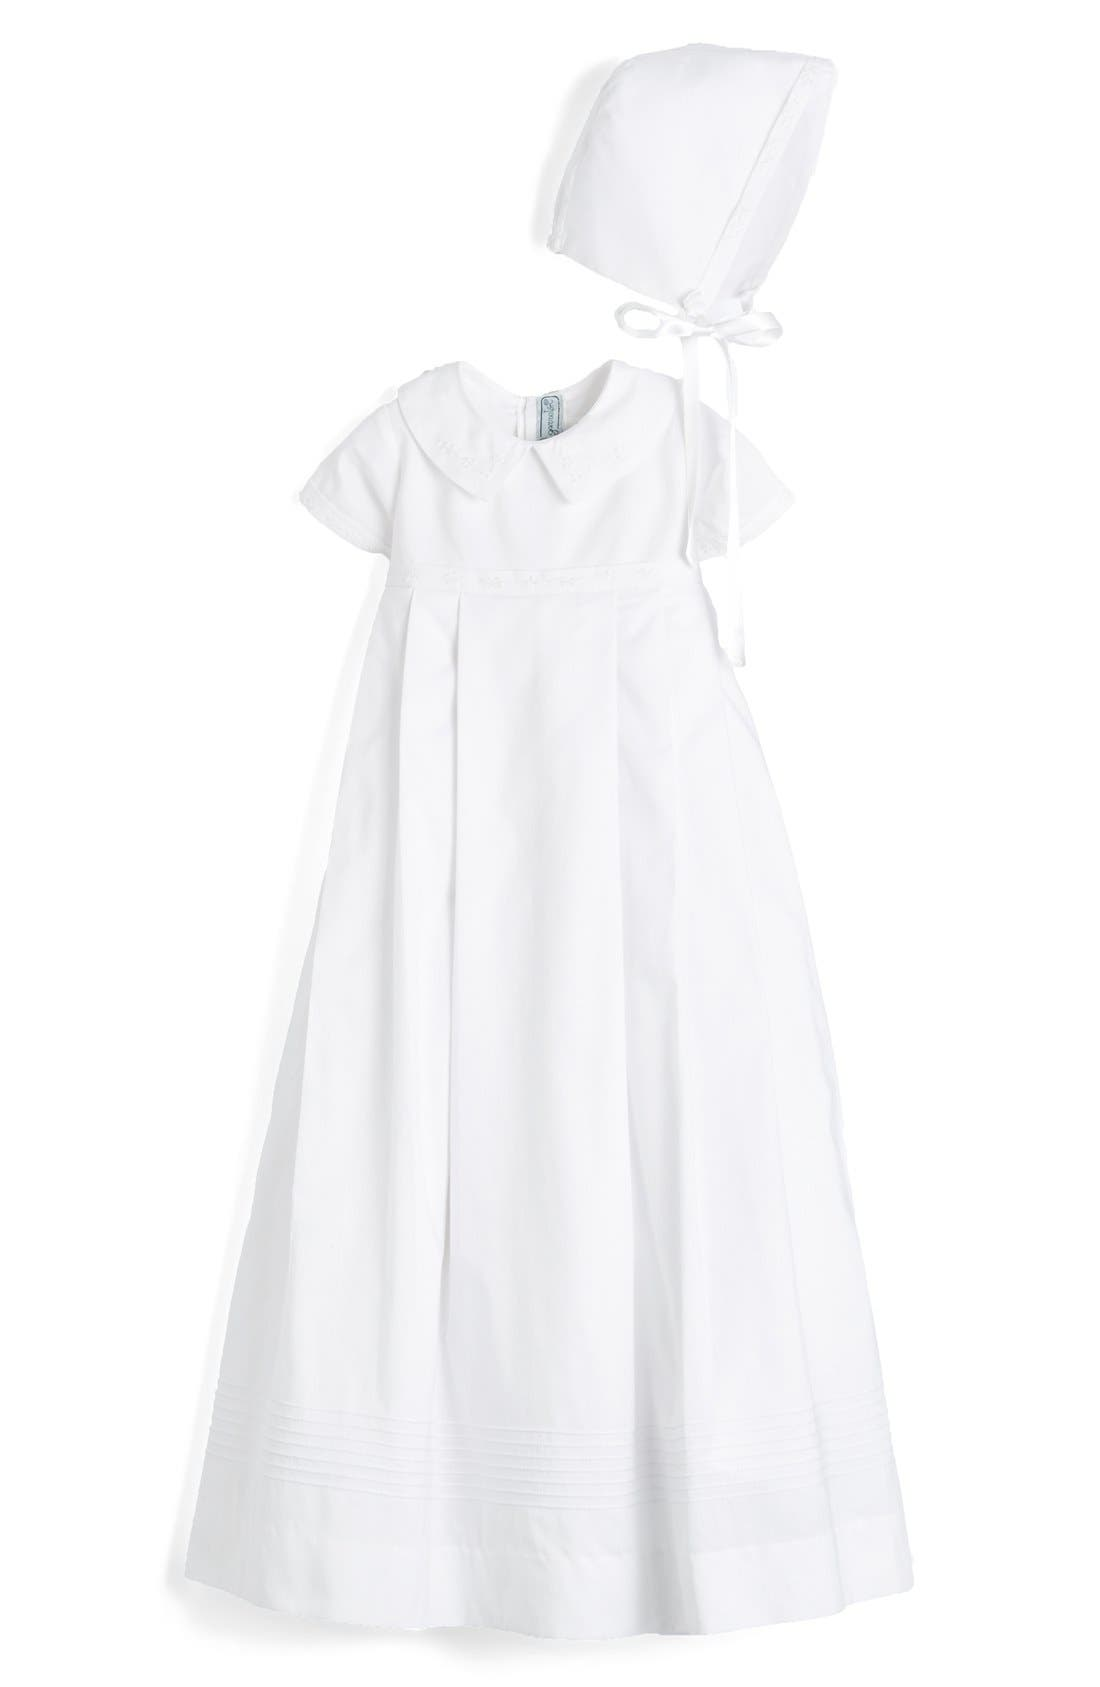 Isabel Garreton 'Classic' Christening Gown & Bonnet (Baby)